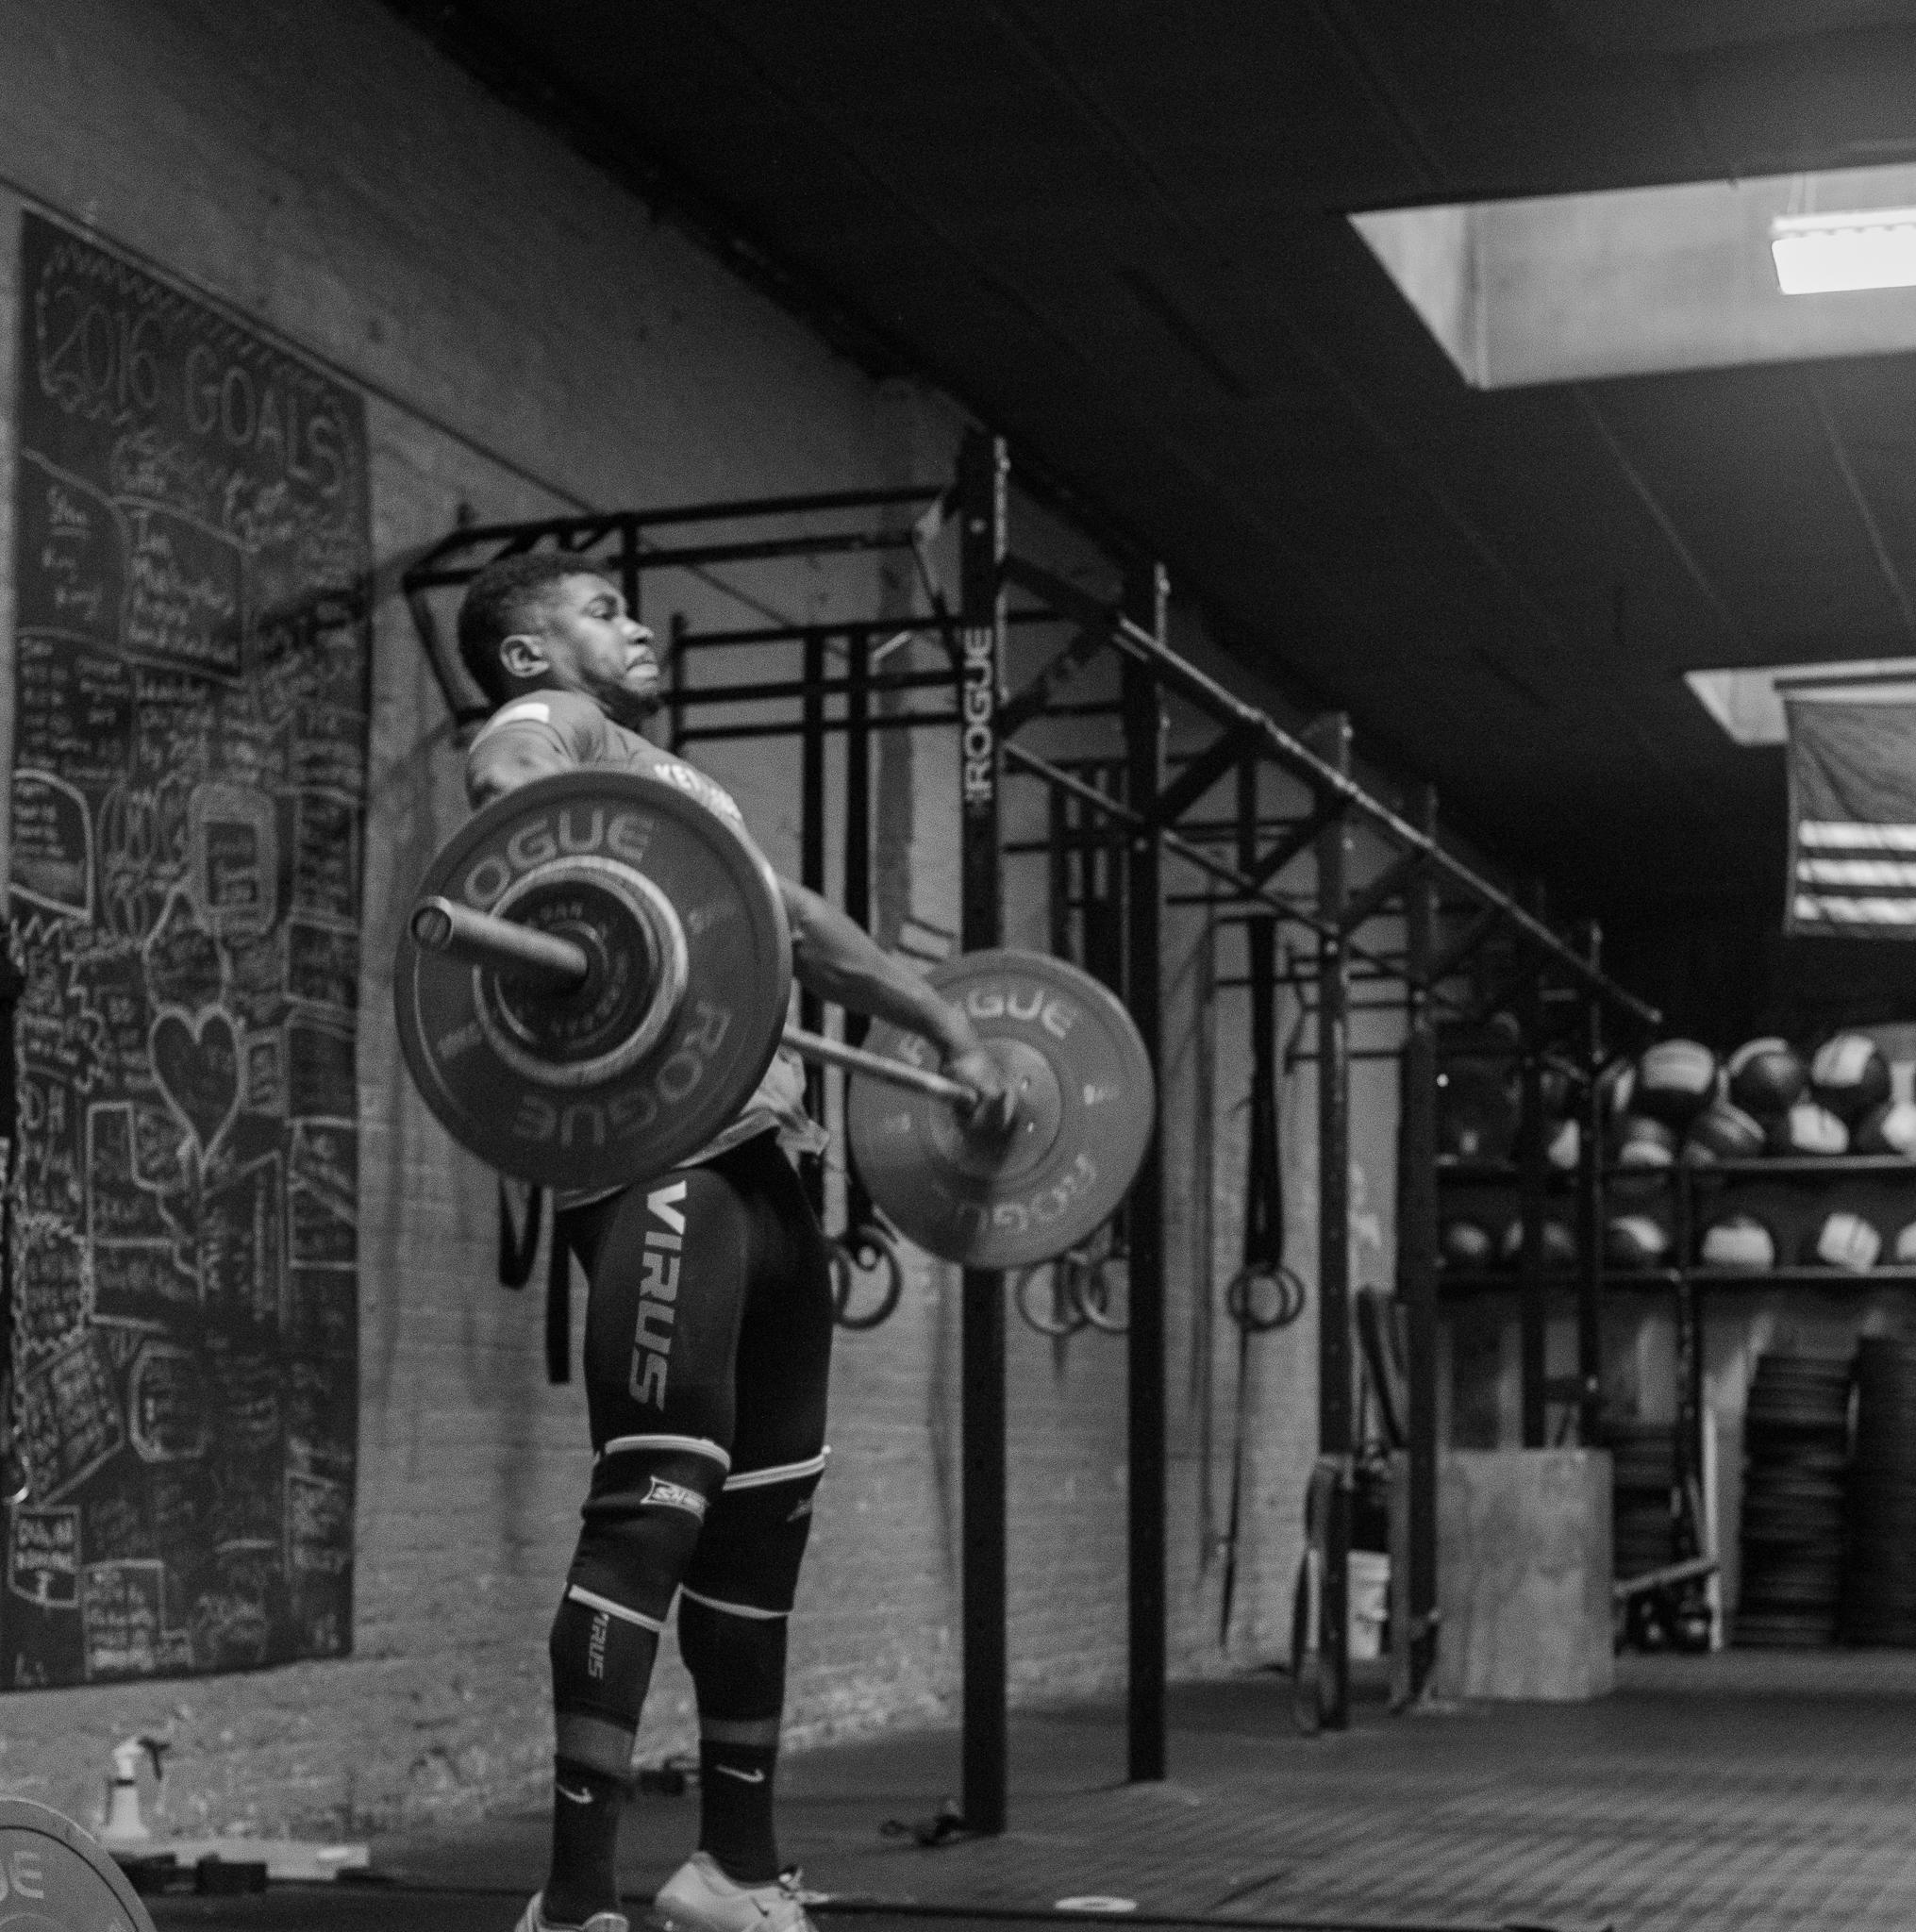 james-wright-visit-brooklyn-new-york-weightlifting-coach-teammates-october-2016 (37 of 92).jpg